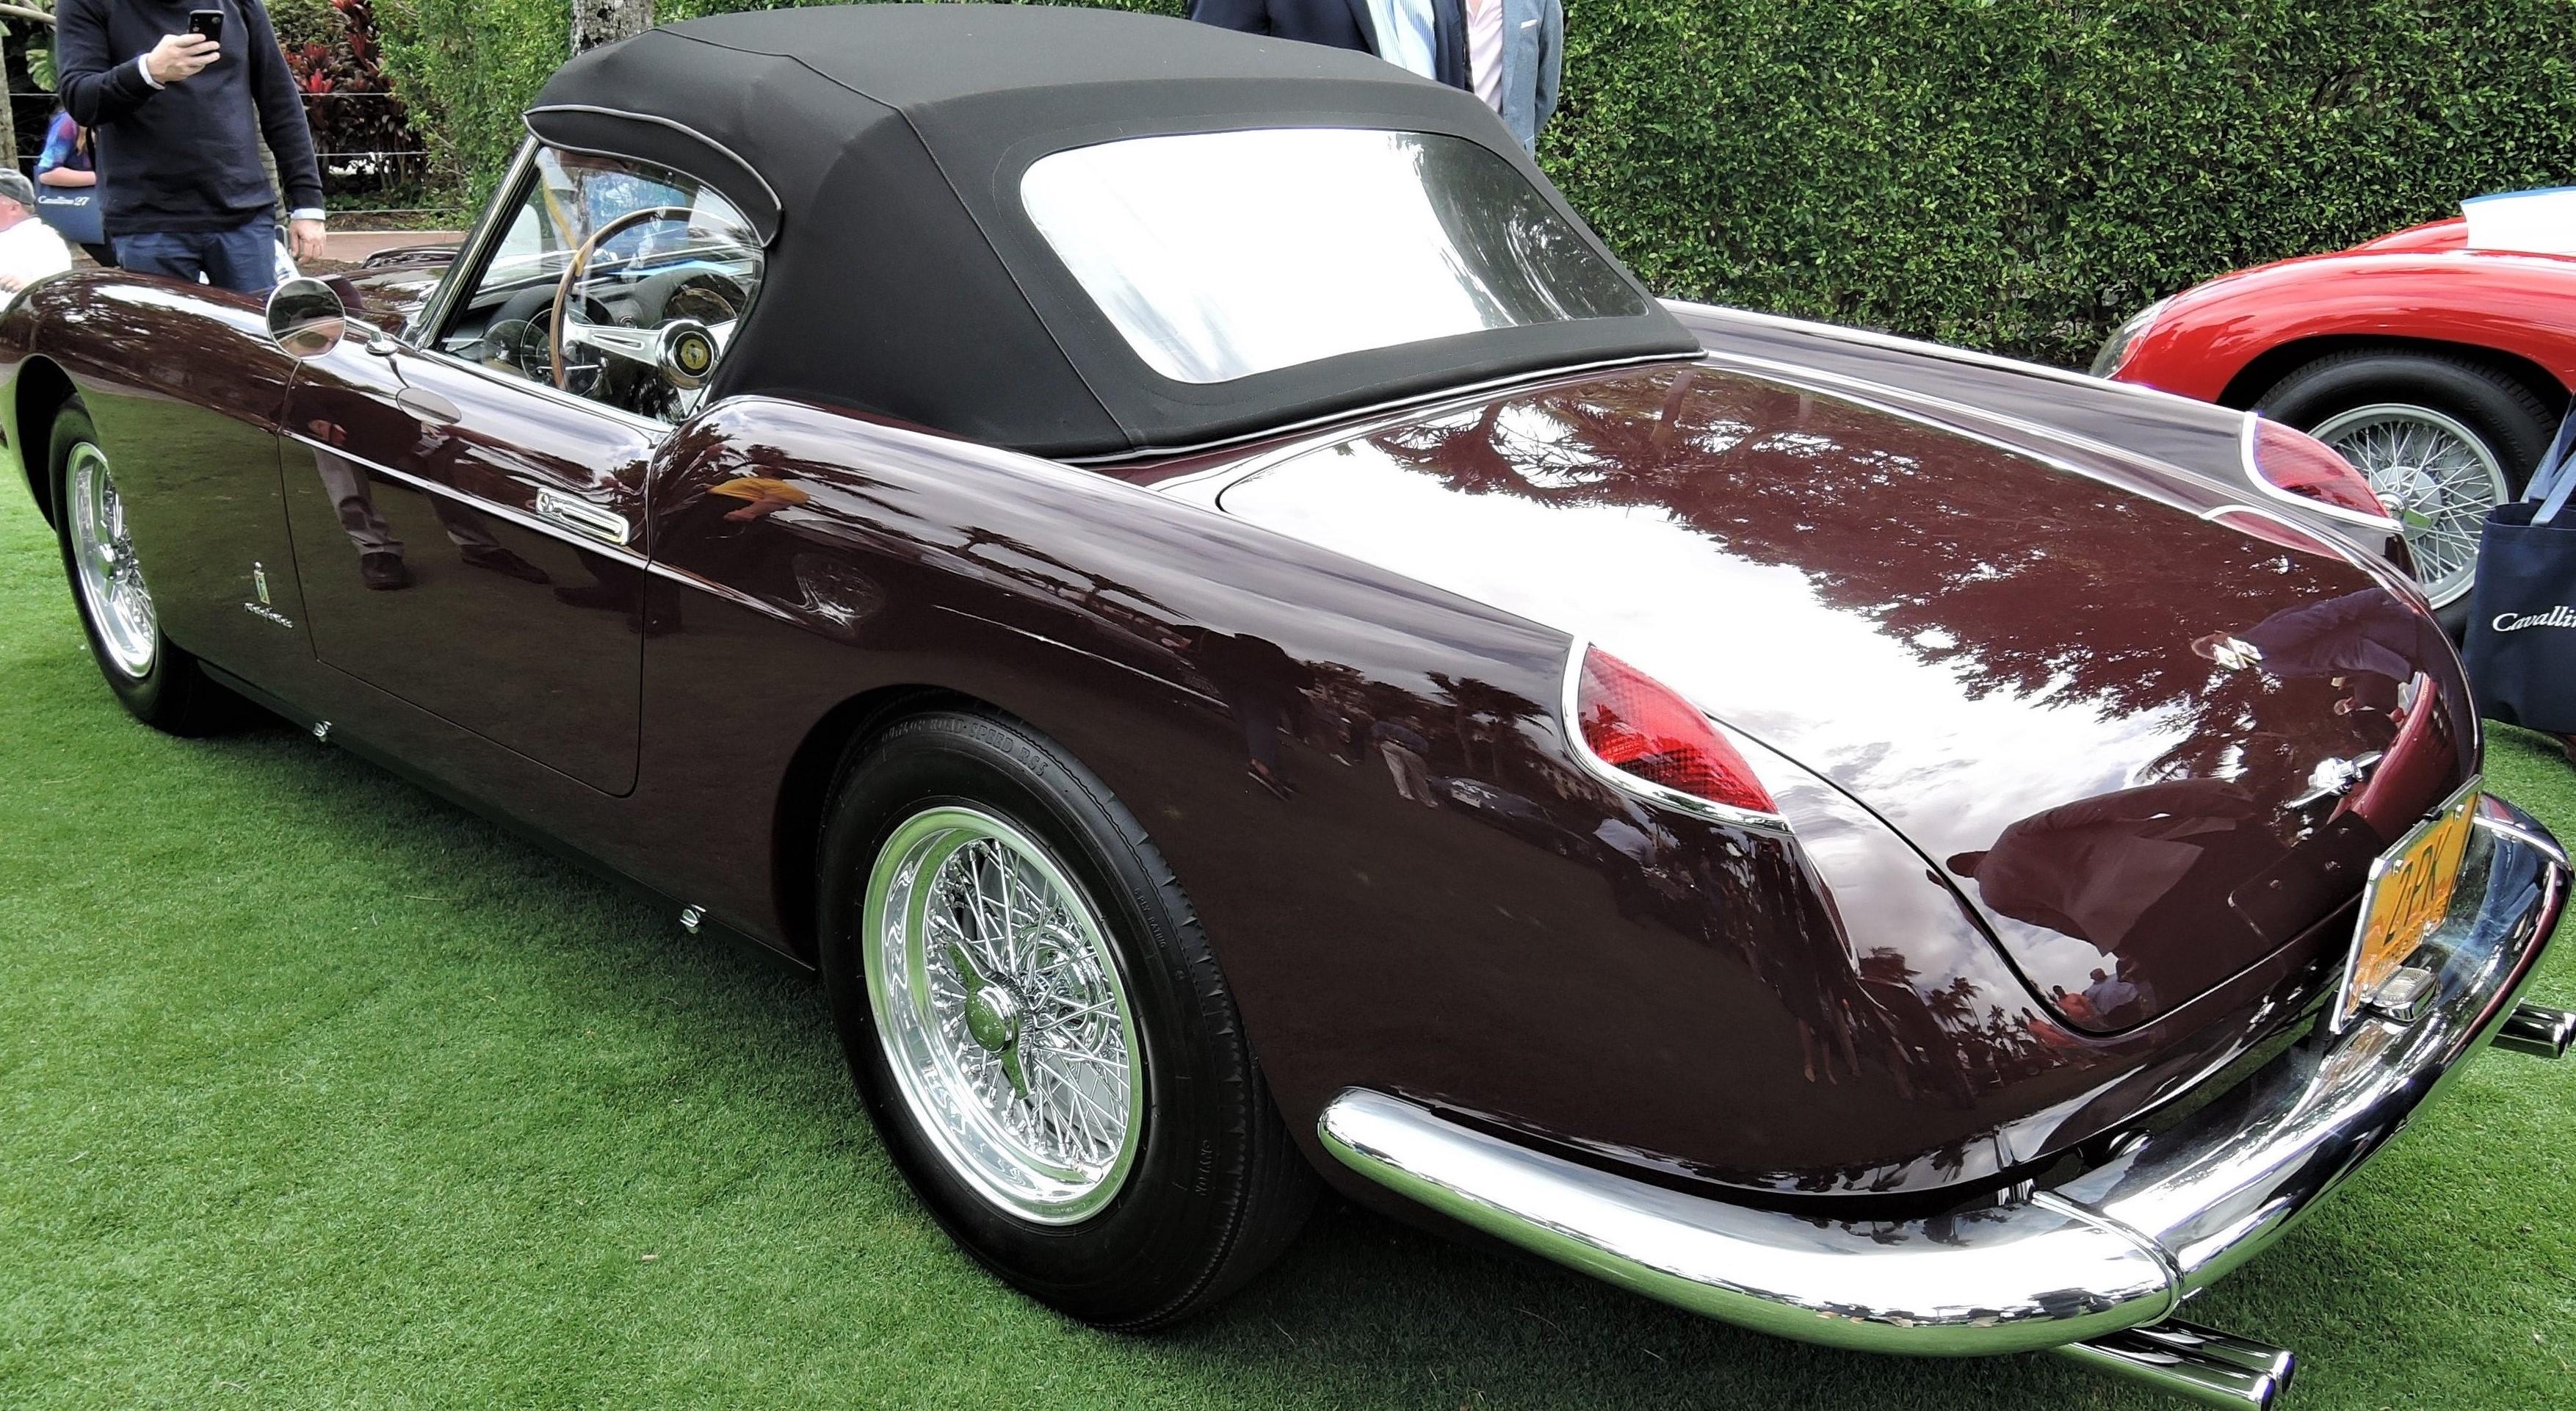 dark red 1958 Ferrari 250 GT PF Cabriolet; Sn 0813 GT - Cavallino 2018 Concours